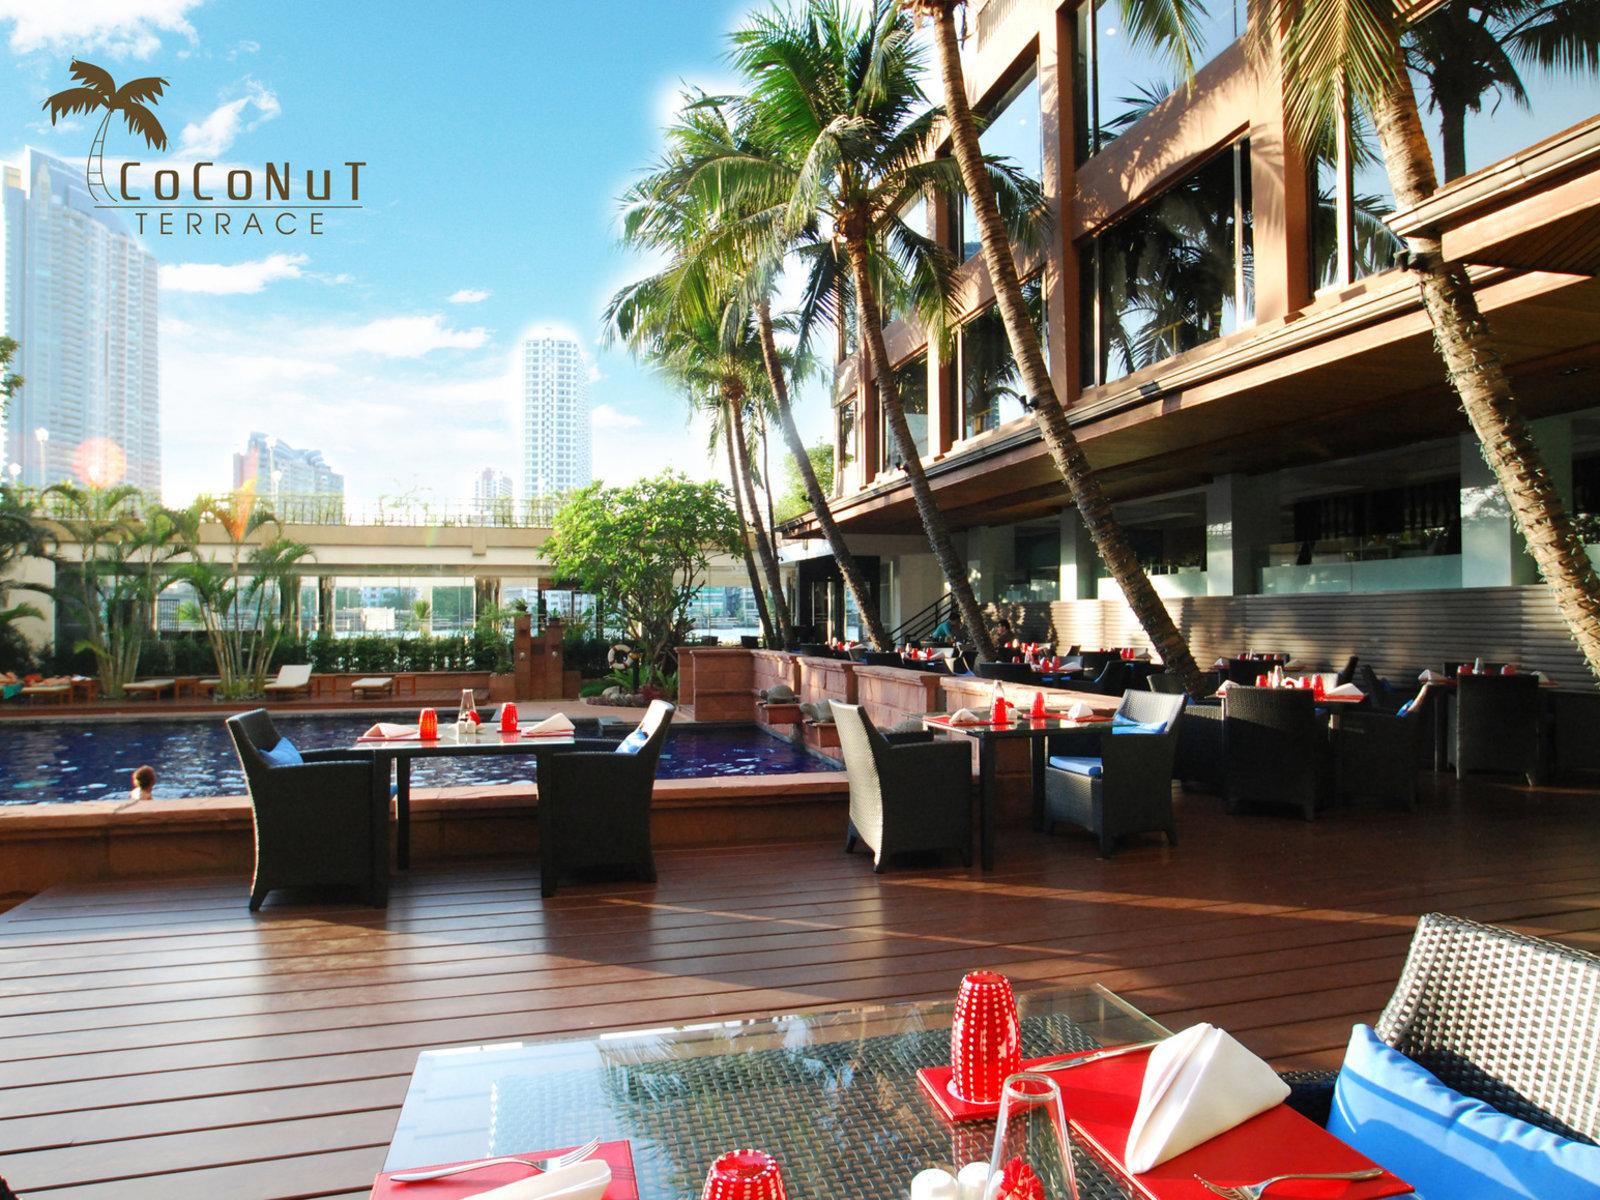 Coconut Terrace